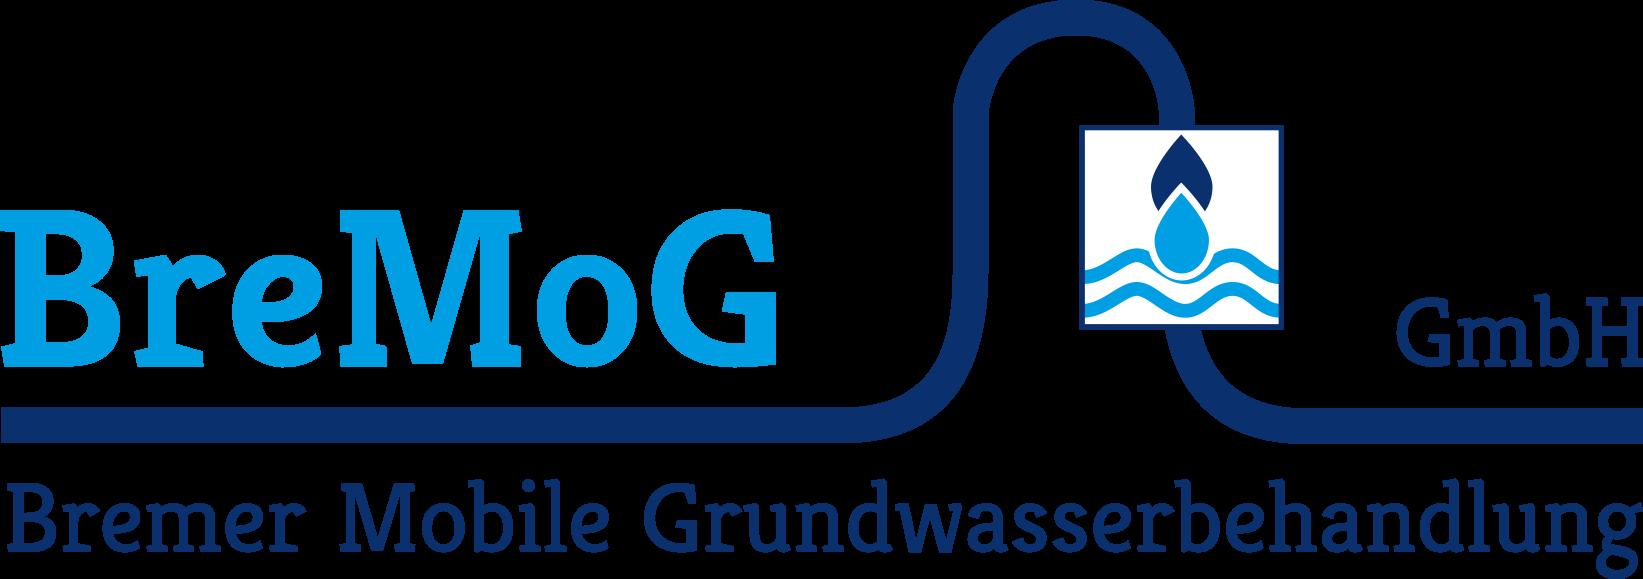 BreMoG GmbH